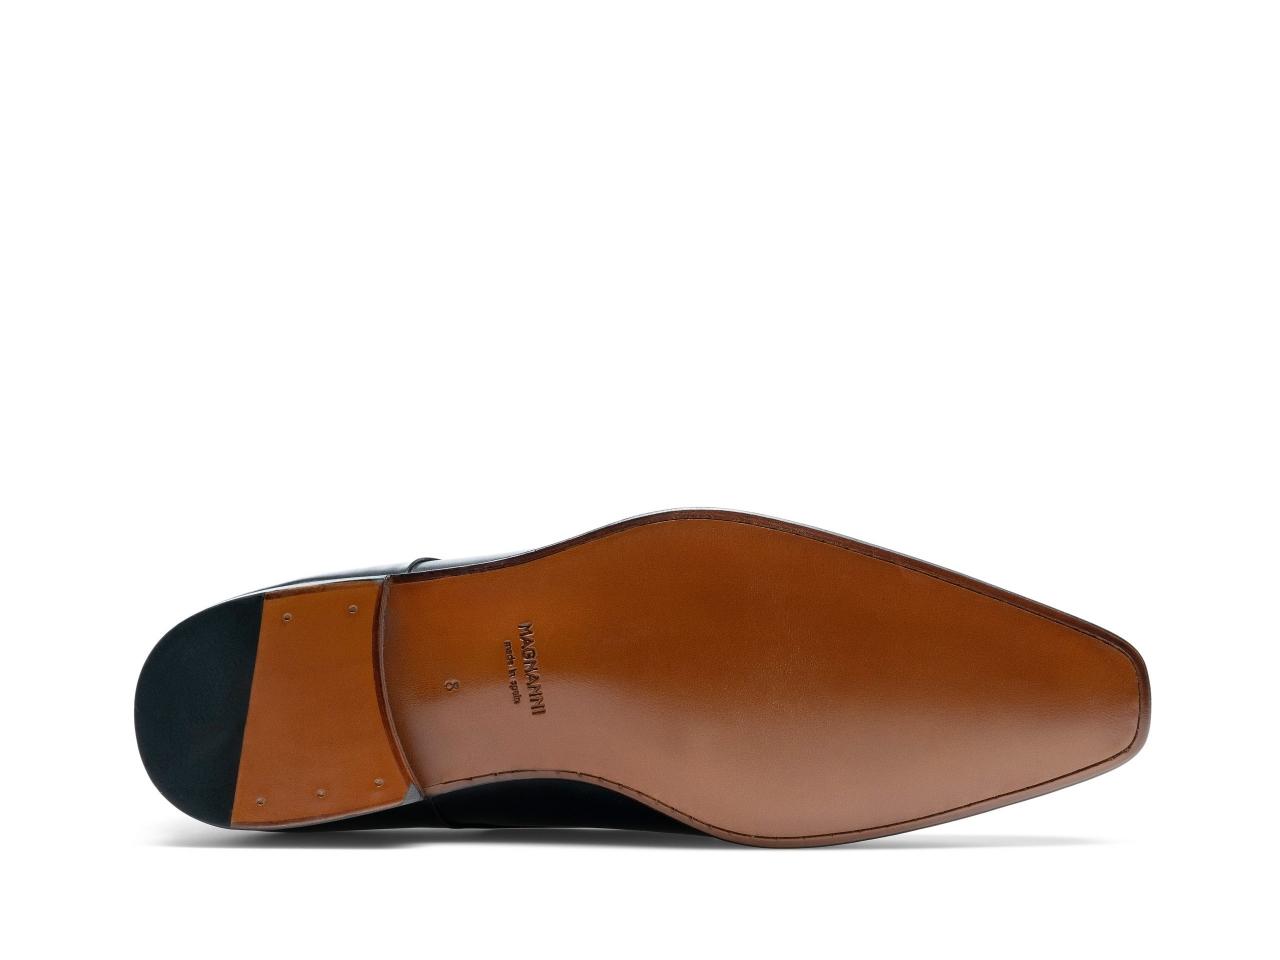 The sole of the Garrett